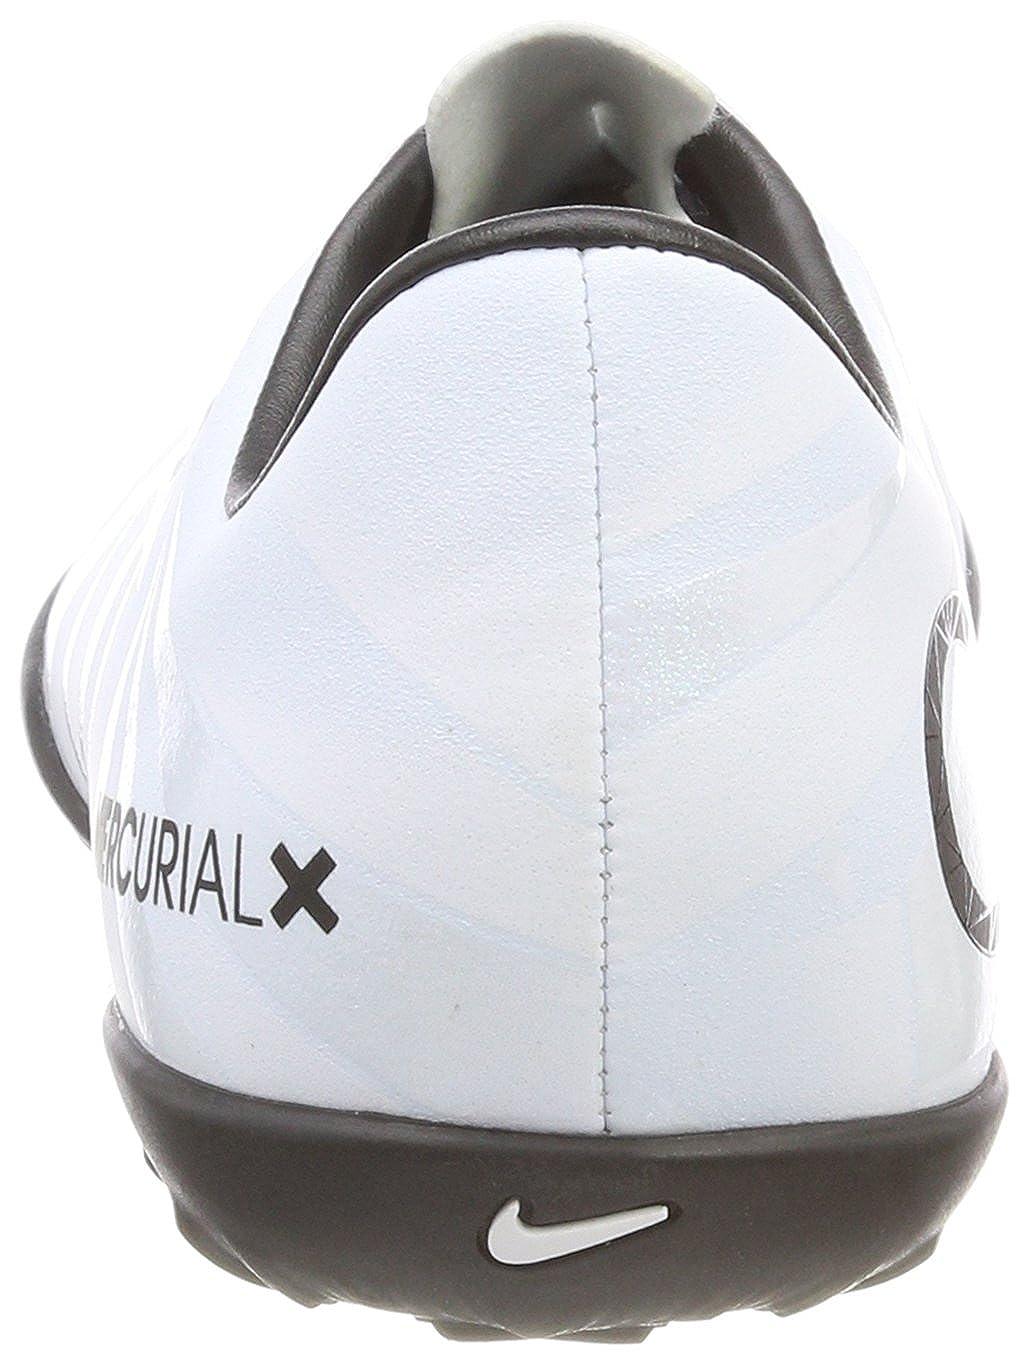 | Nike Kids/' Jr TF | Soccer Turf Soccer Shoes 10C MercurialX Victory VI CR7